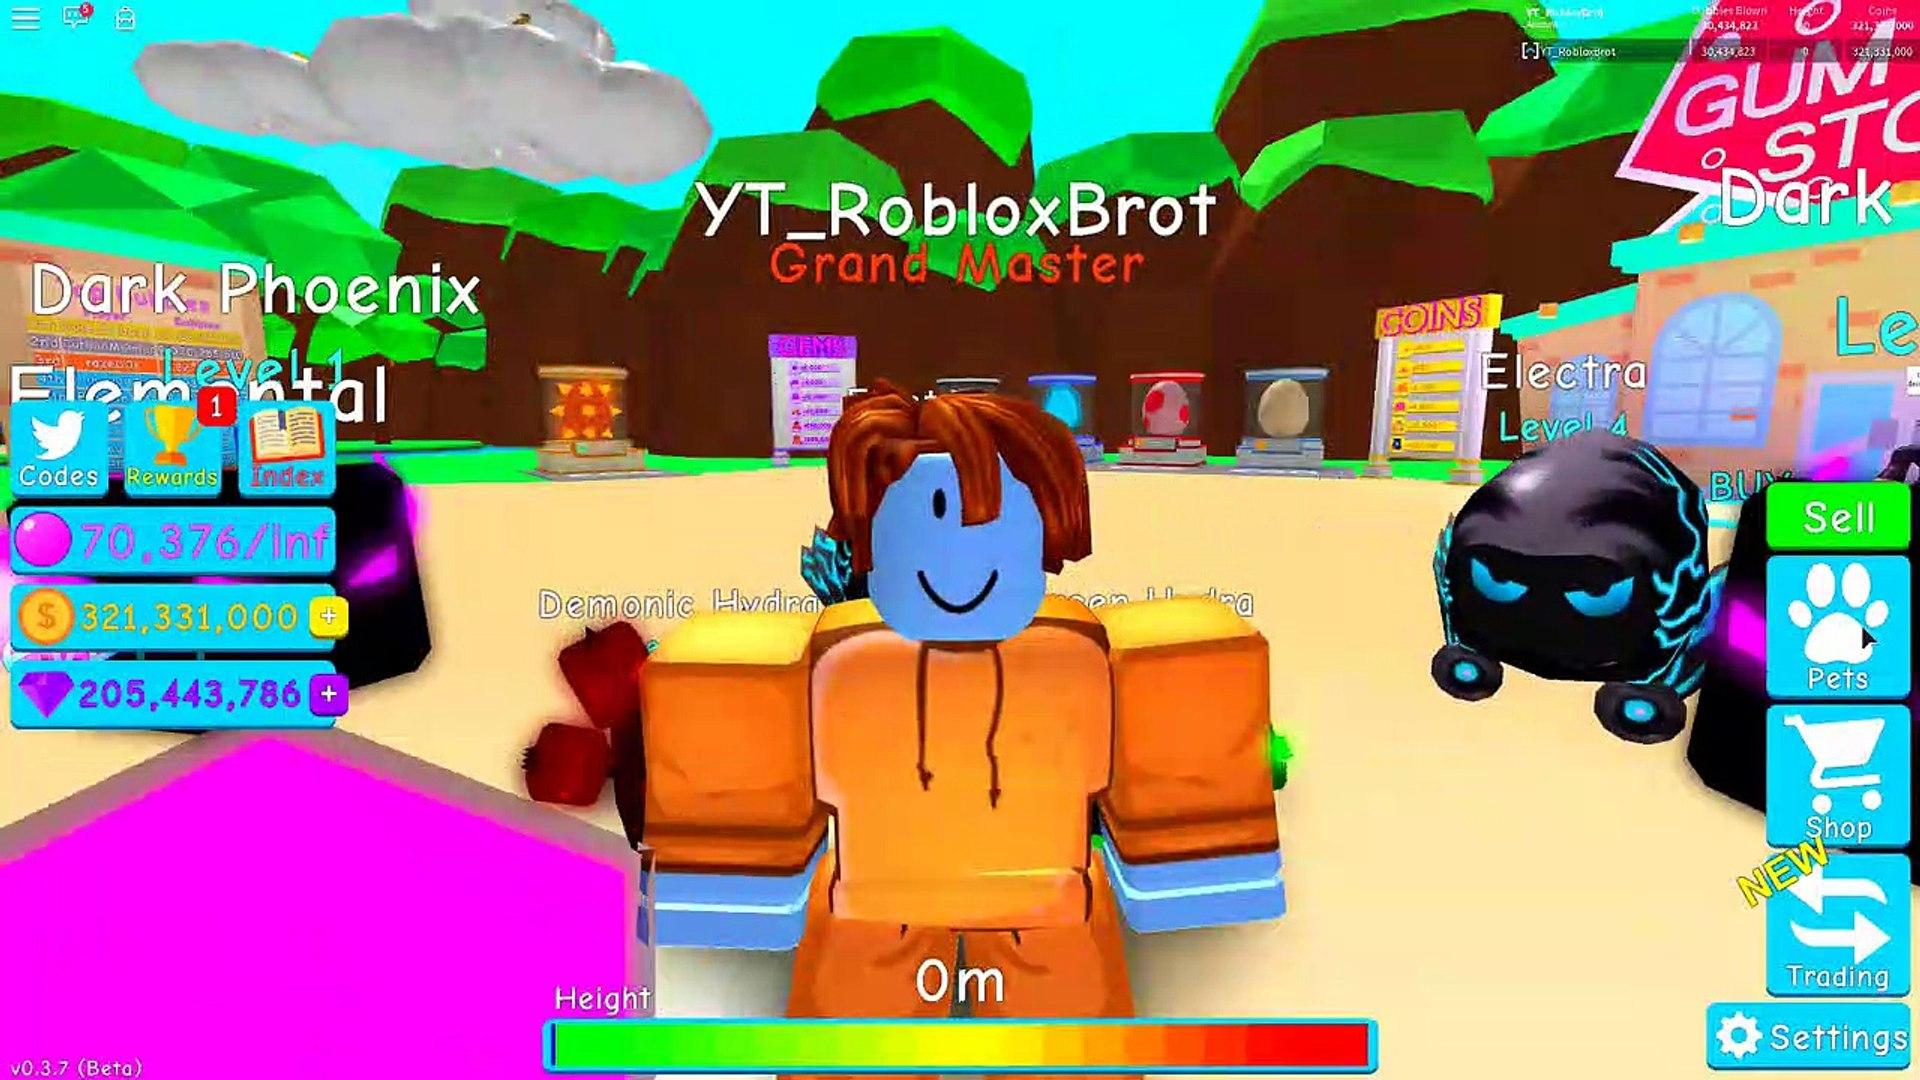 I Got The Demonic Hydra Pet Best Possible Pet Roblox - All Pets Unlock Showcase Roblox Bubble Gum Simulator Video